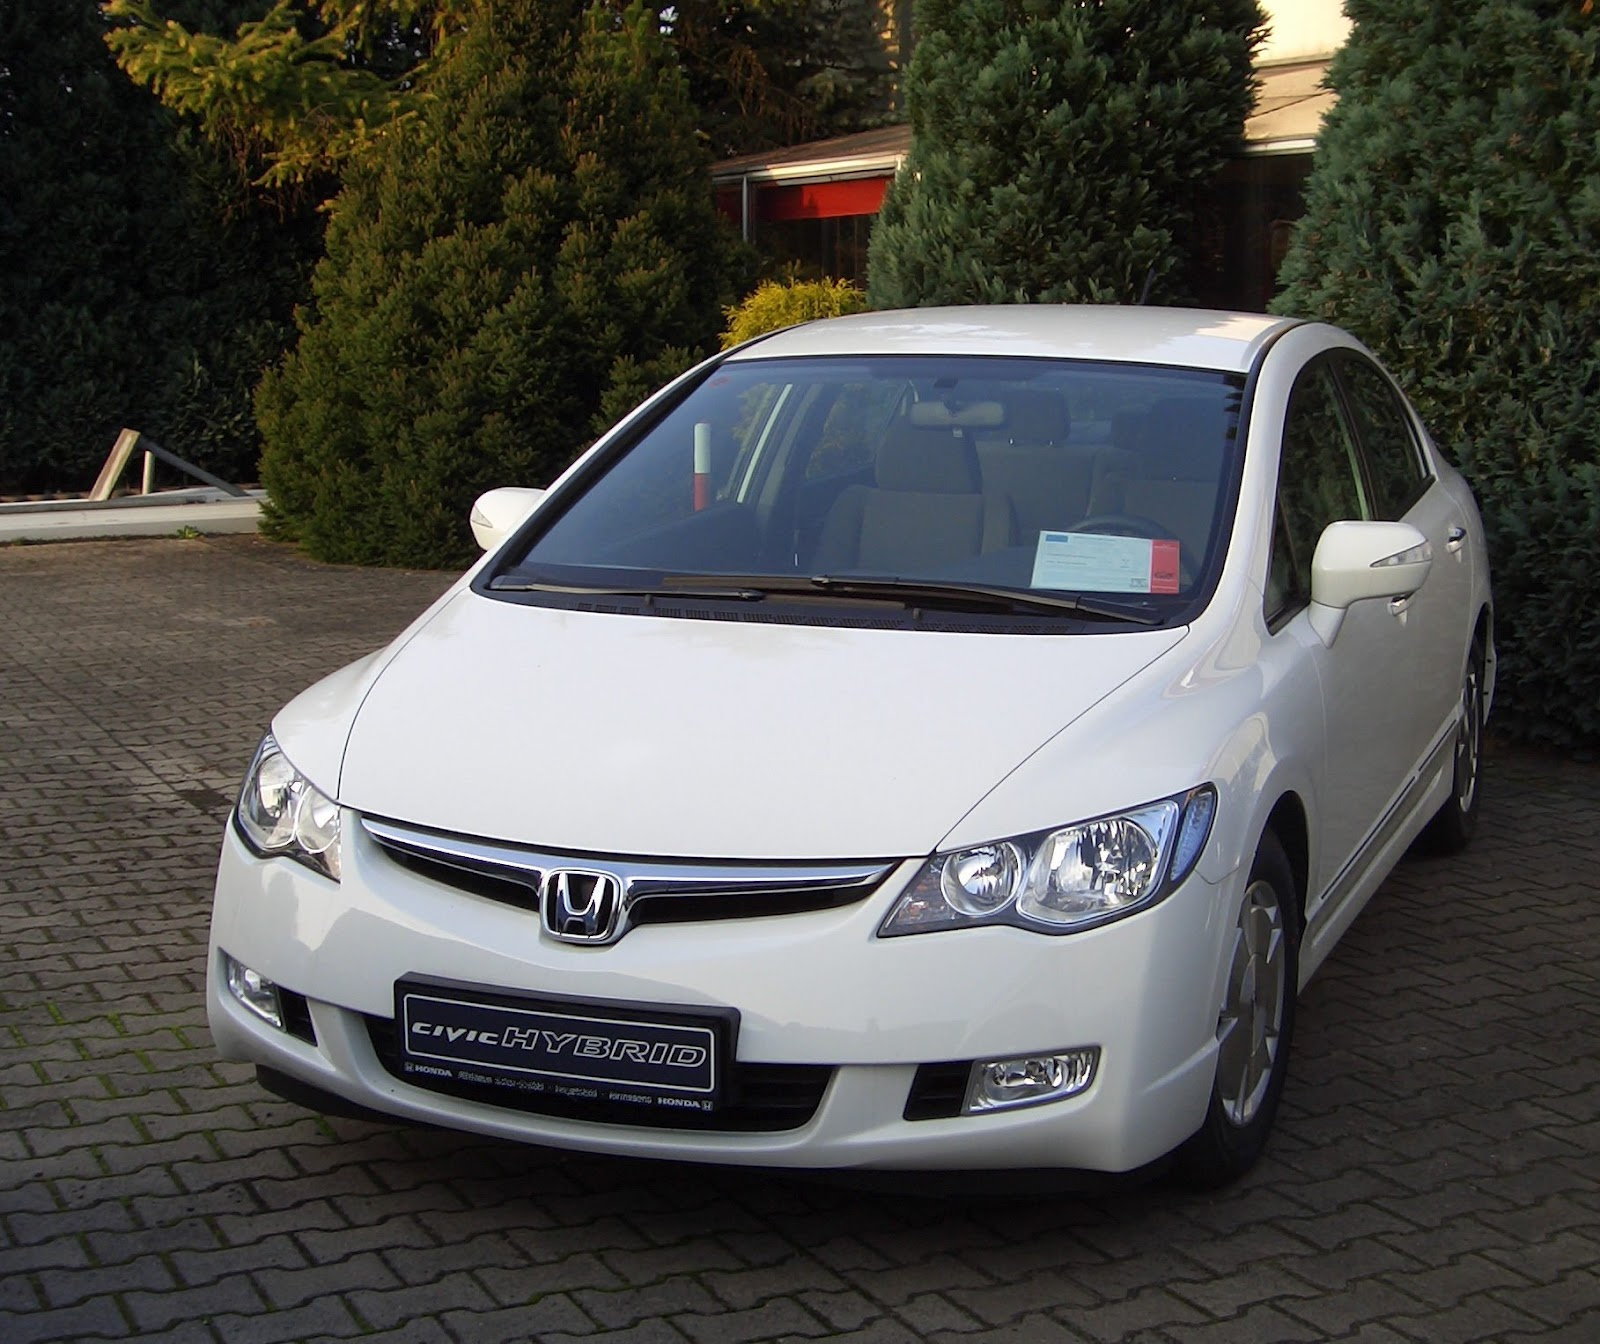 auto mobiles: honda civic hybrid